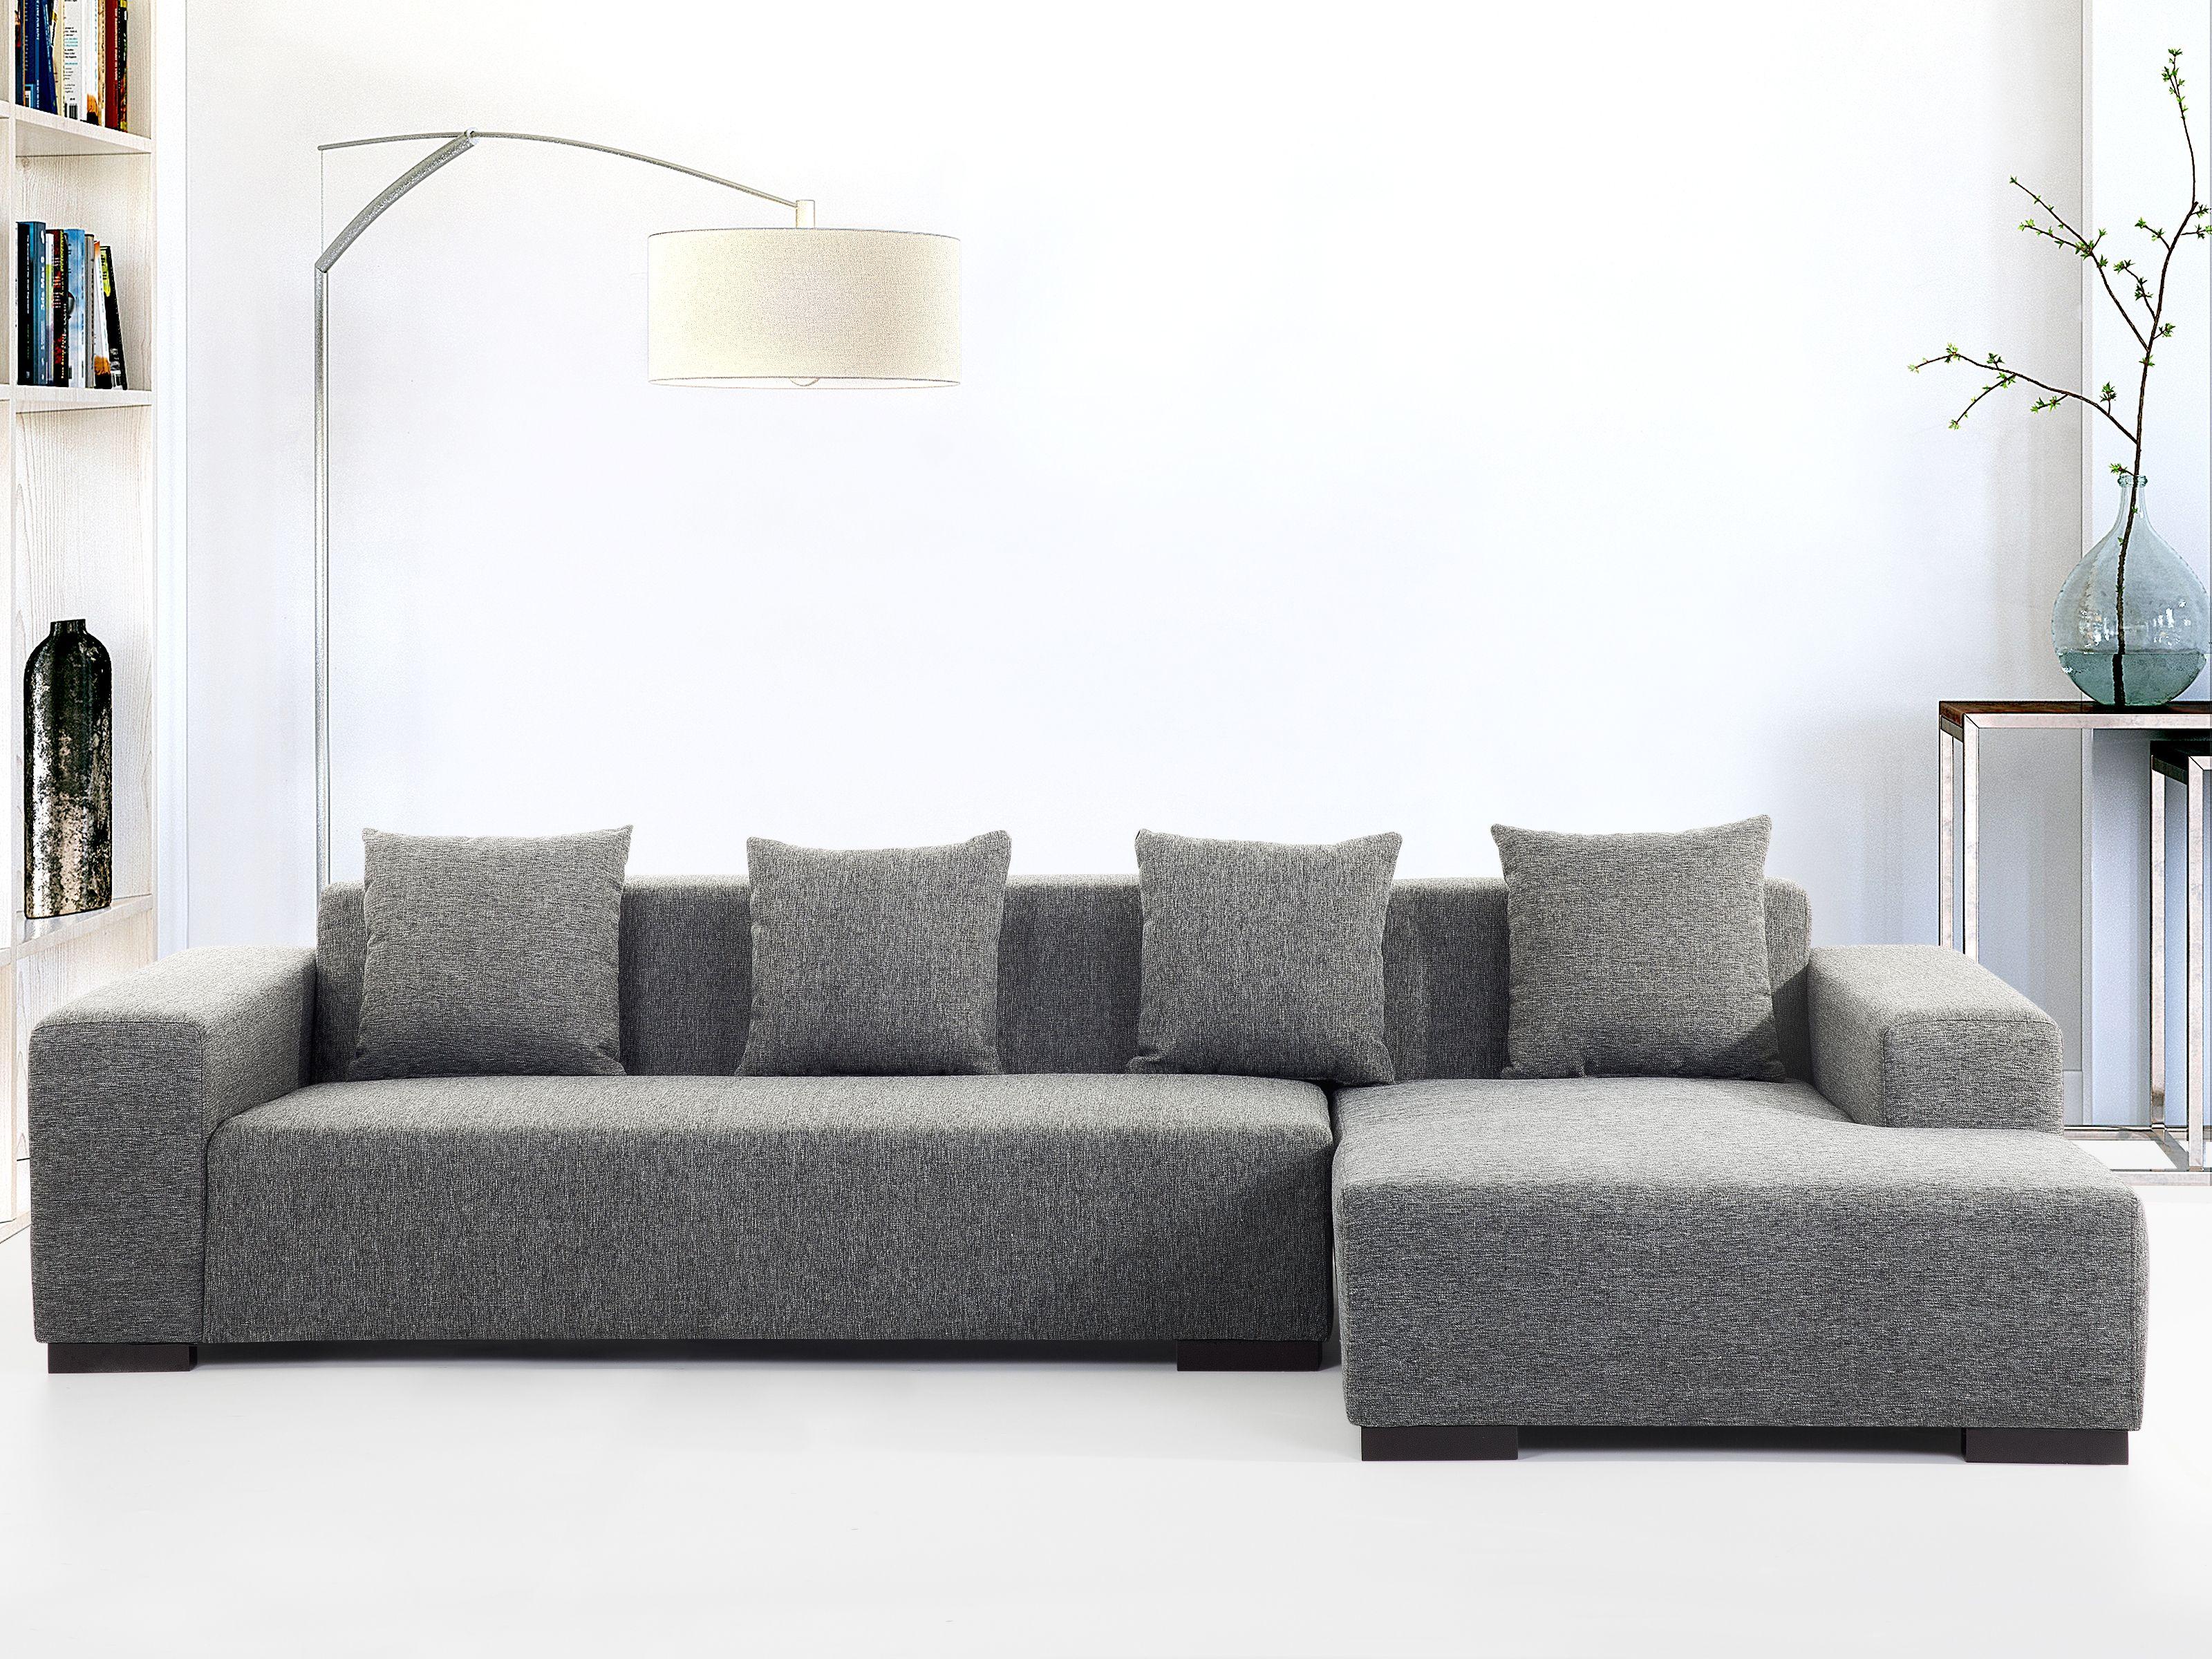 Left Hand Fabric Corner Sofa Dark Gray Lungo With Images Modern Sofa Sectional Fabric Sectional Sofas Modern Fabric Sectional Sofa